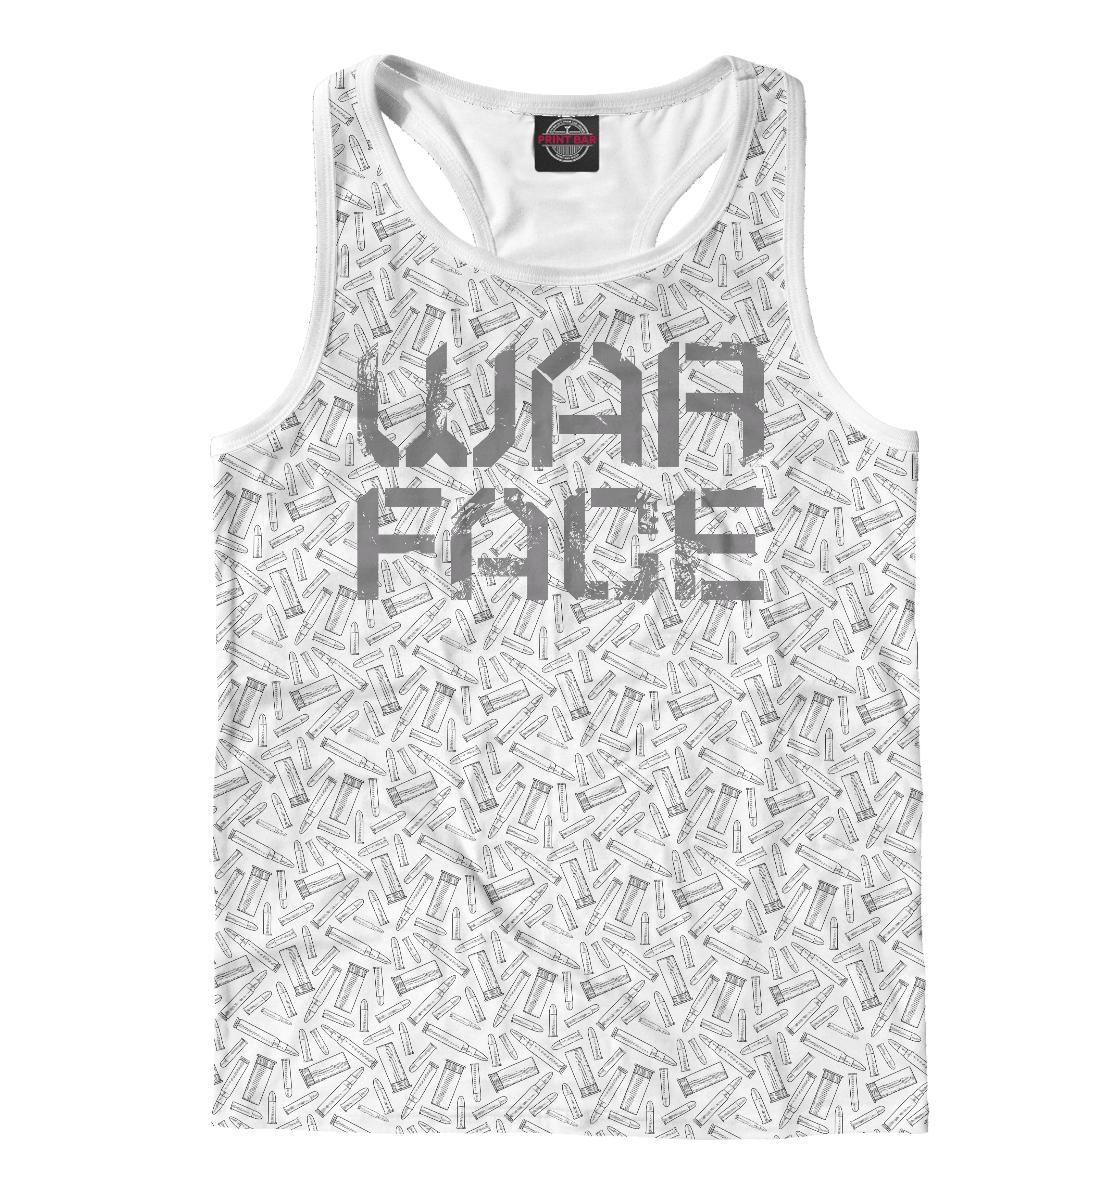 Купить Warface, Printbar, Майки борцовки, RPG-126789-mayb-2